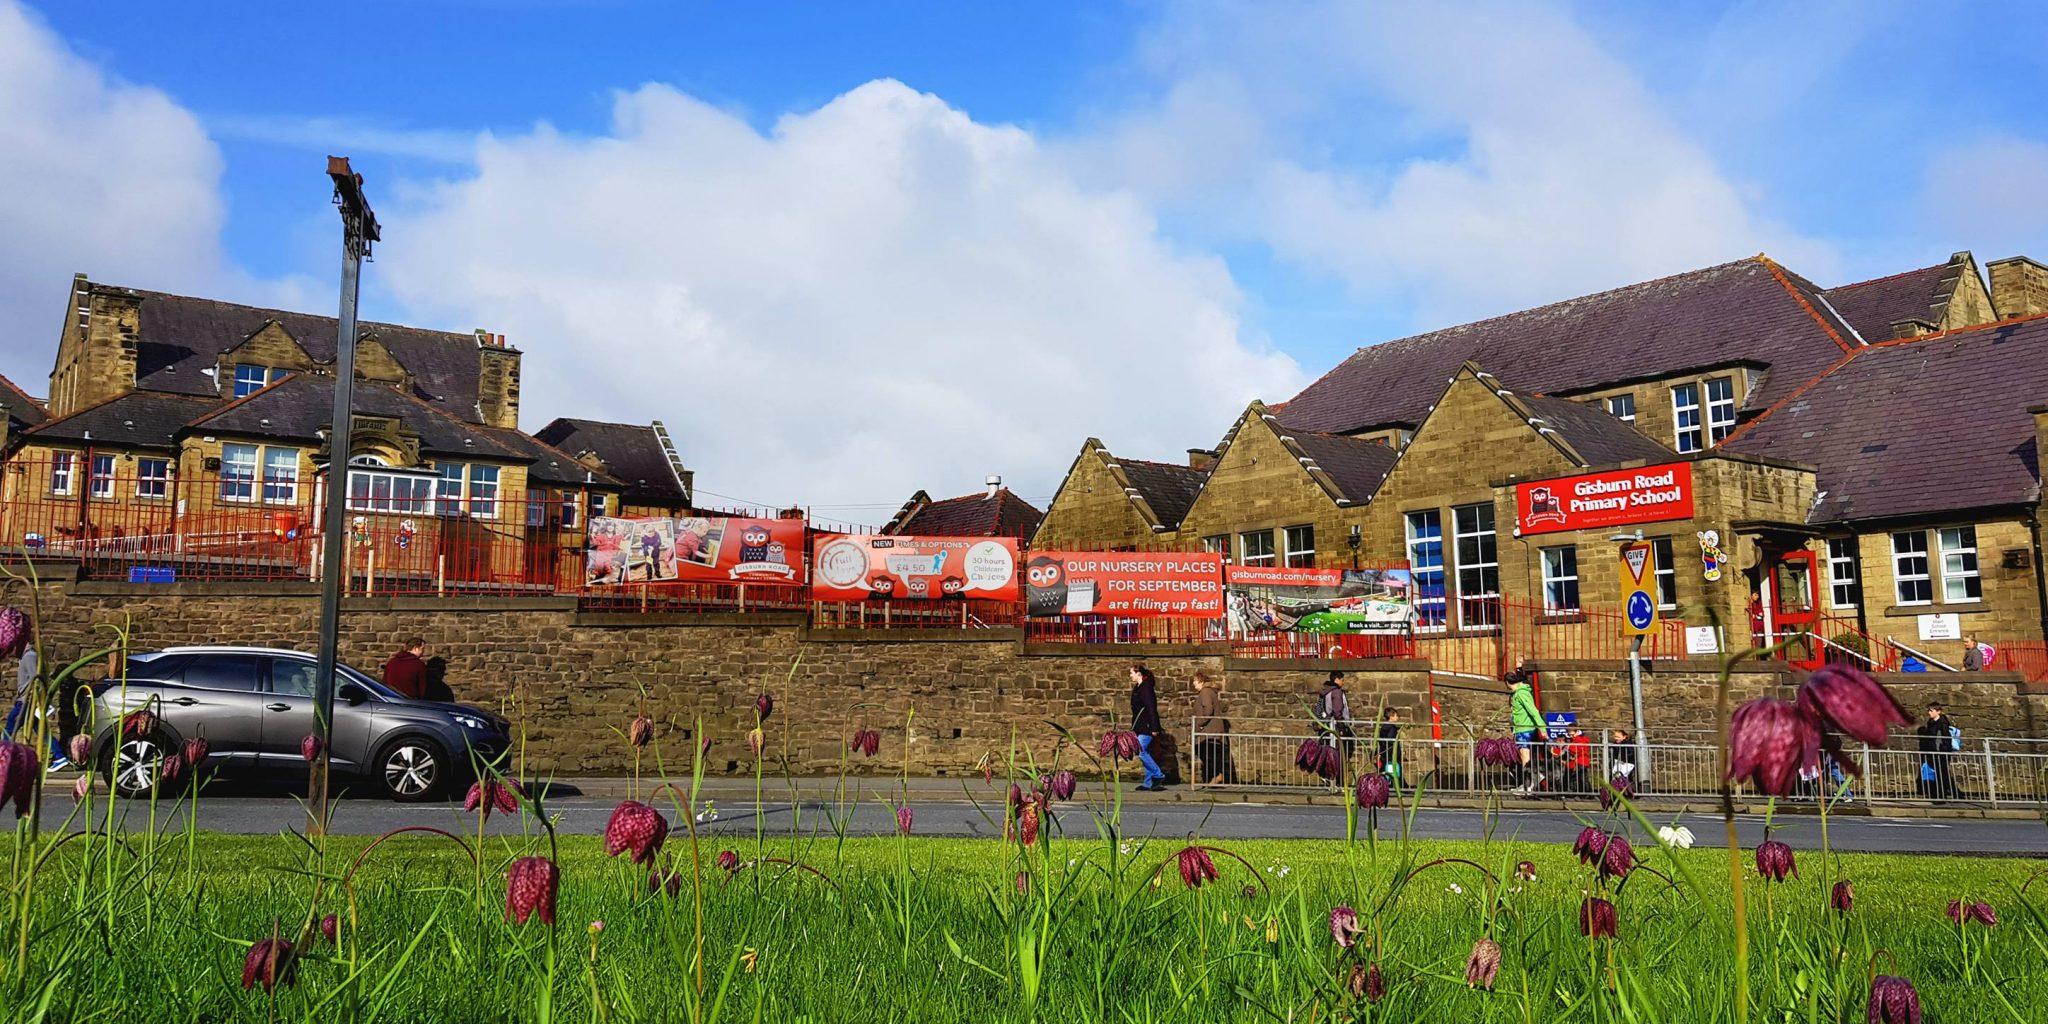 barnoldswick-gisburn-road-school-from-town-green